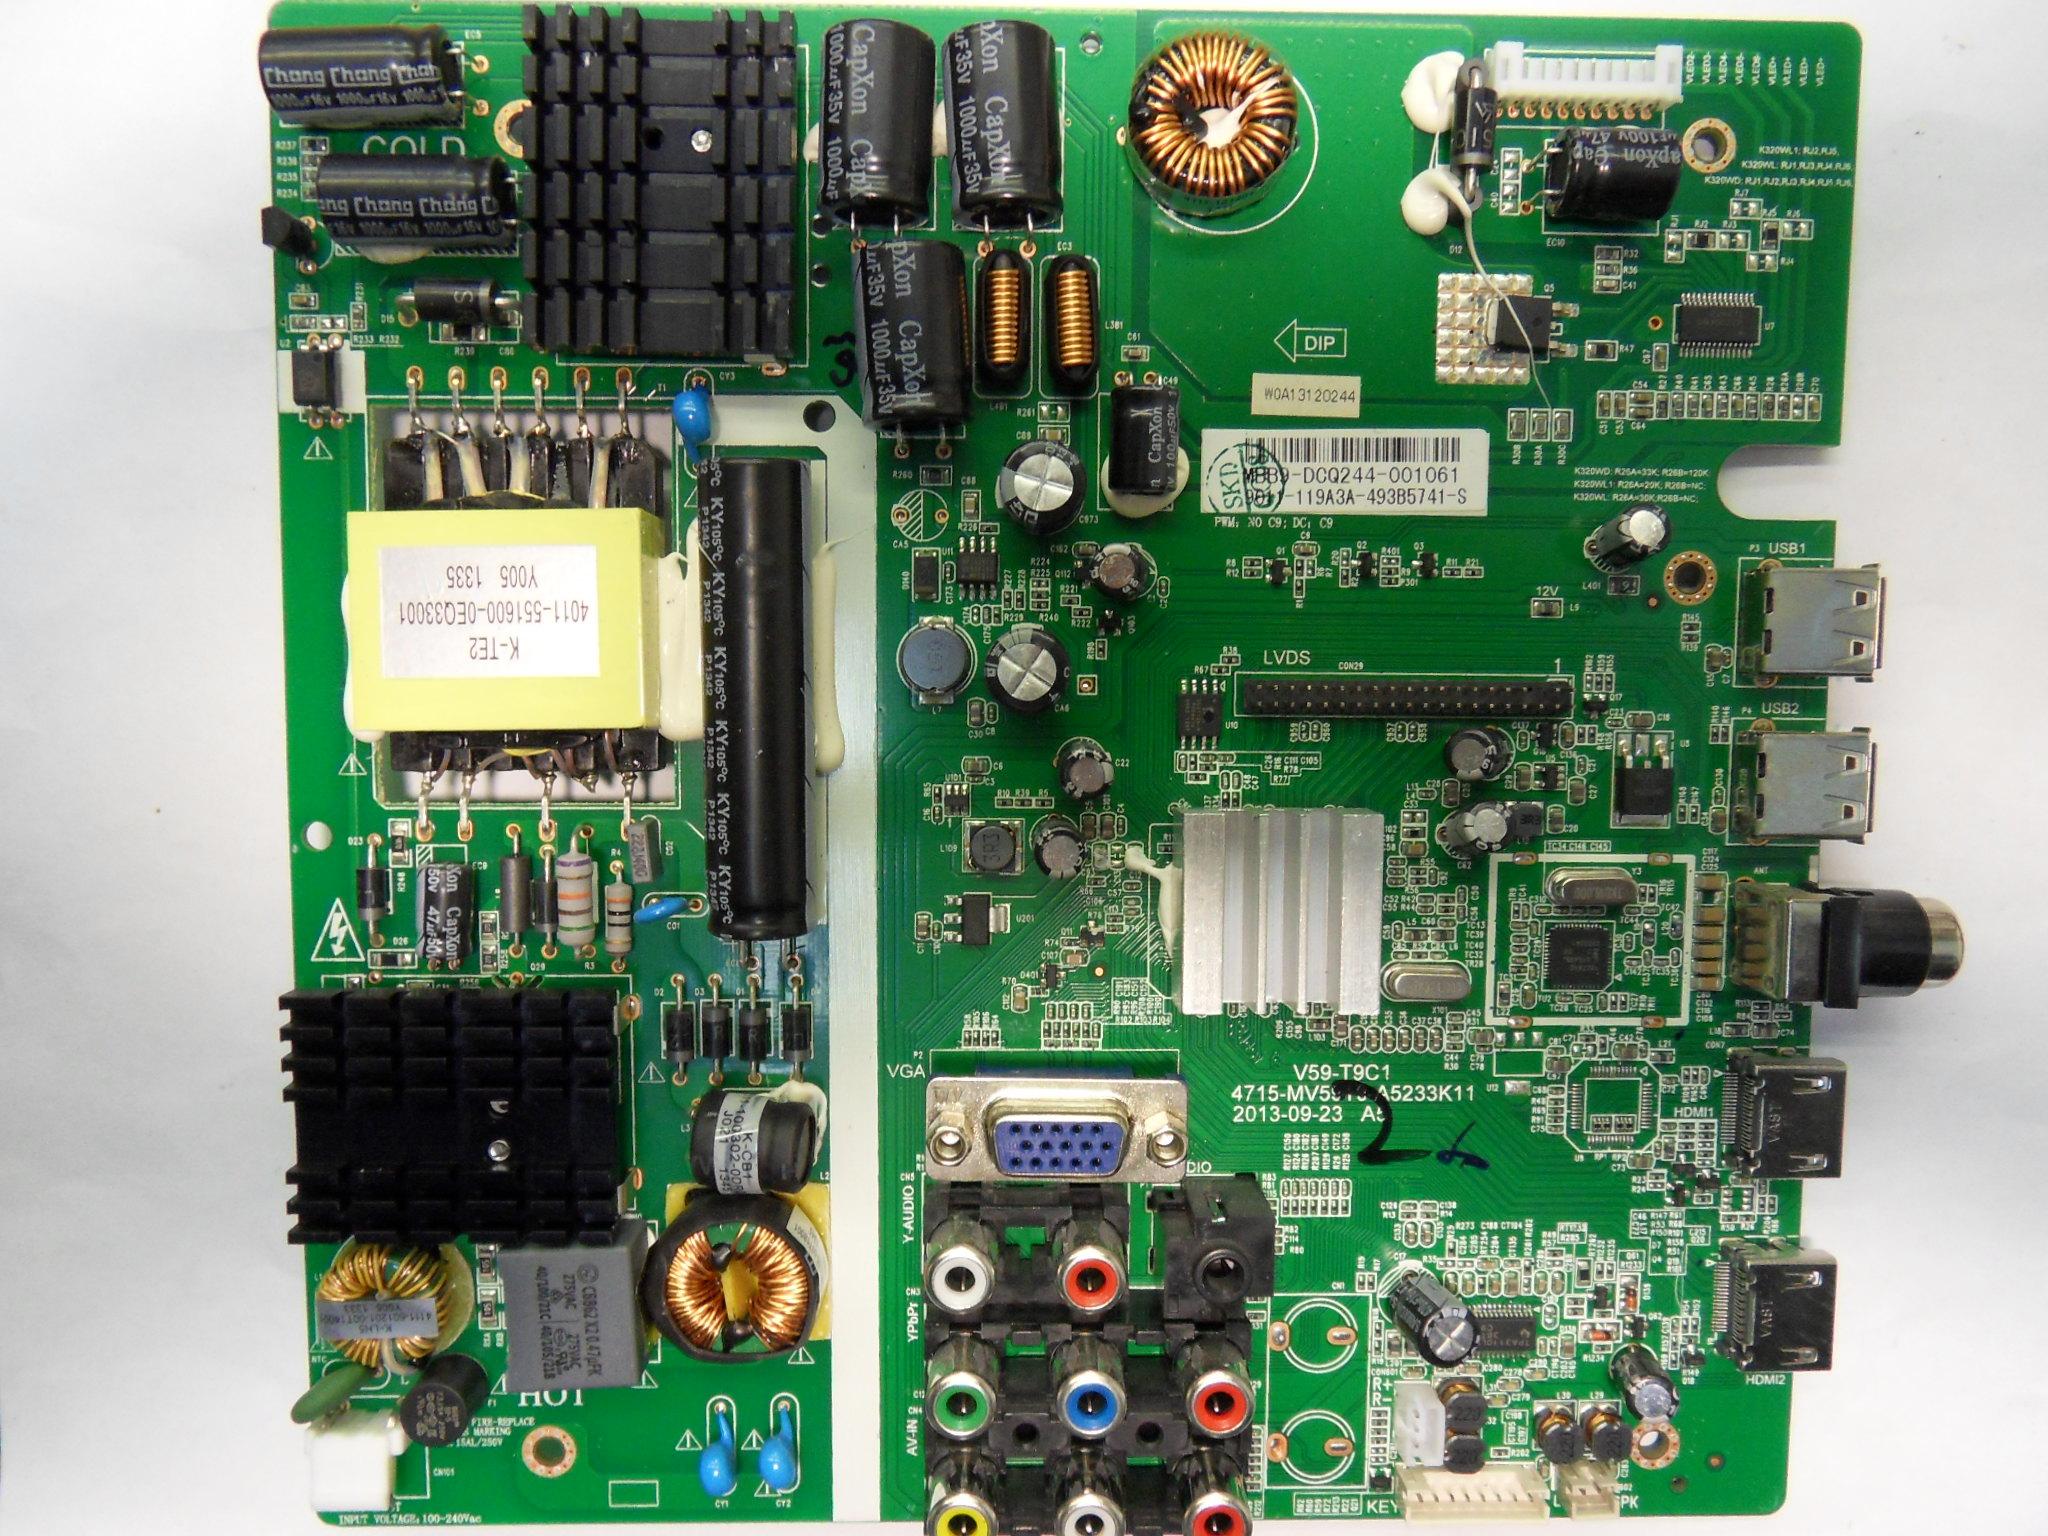 China Led Tv Firmware V59- T9c1